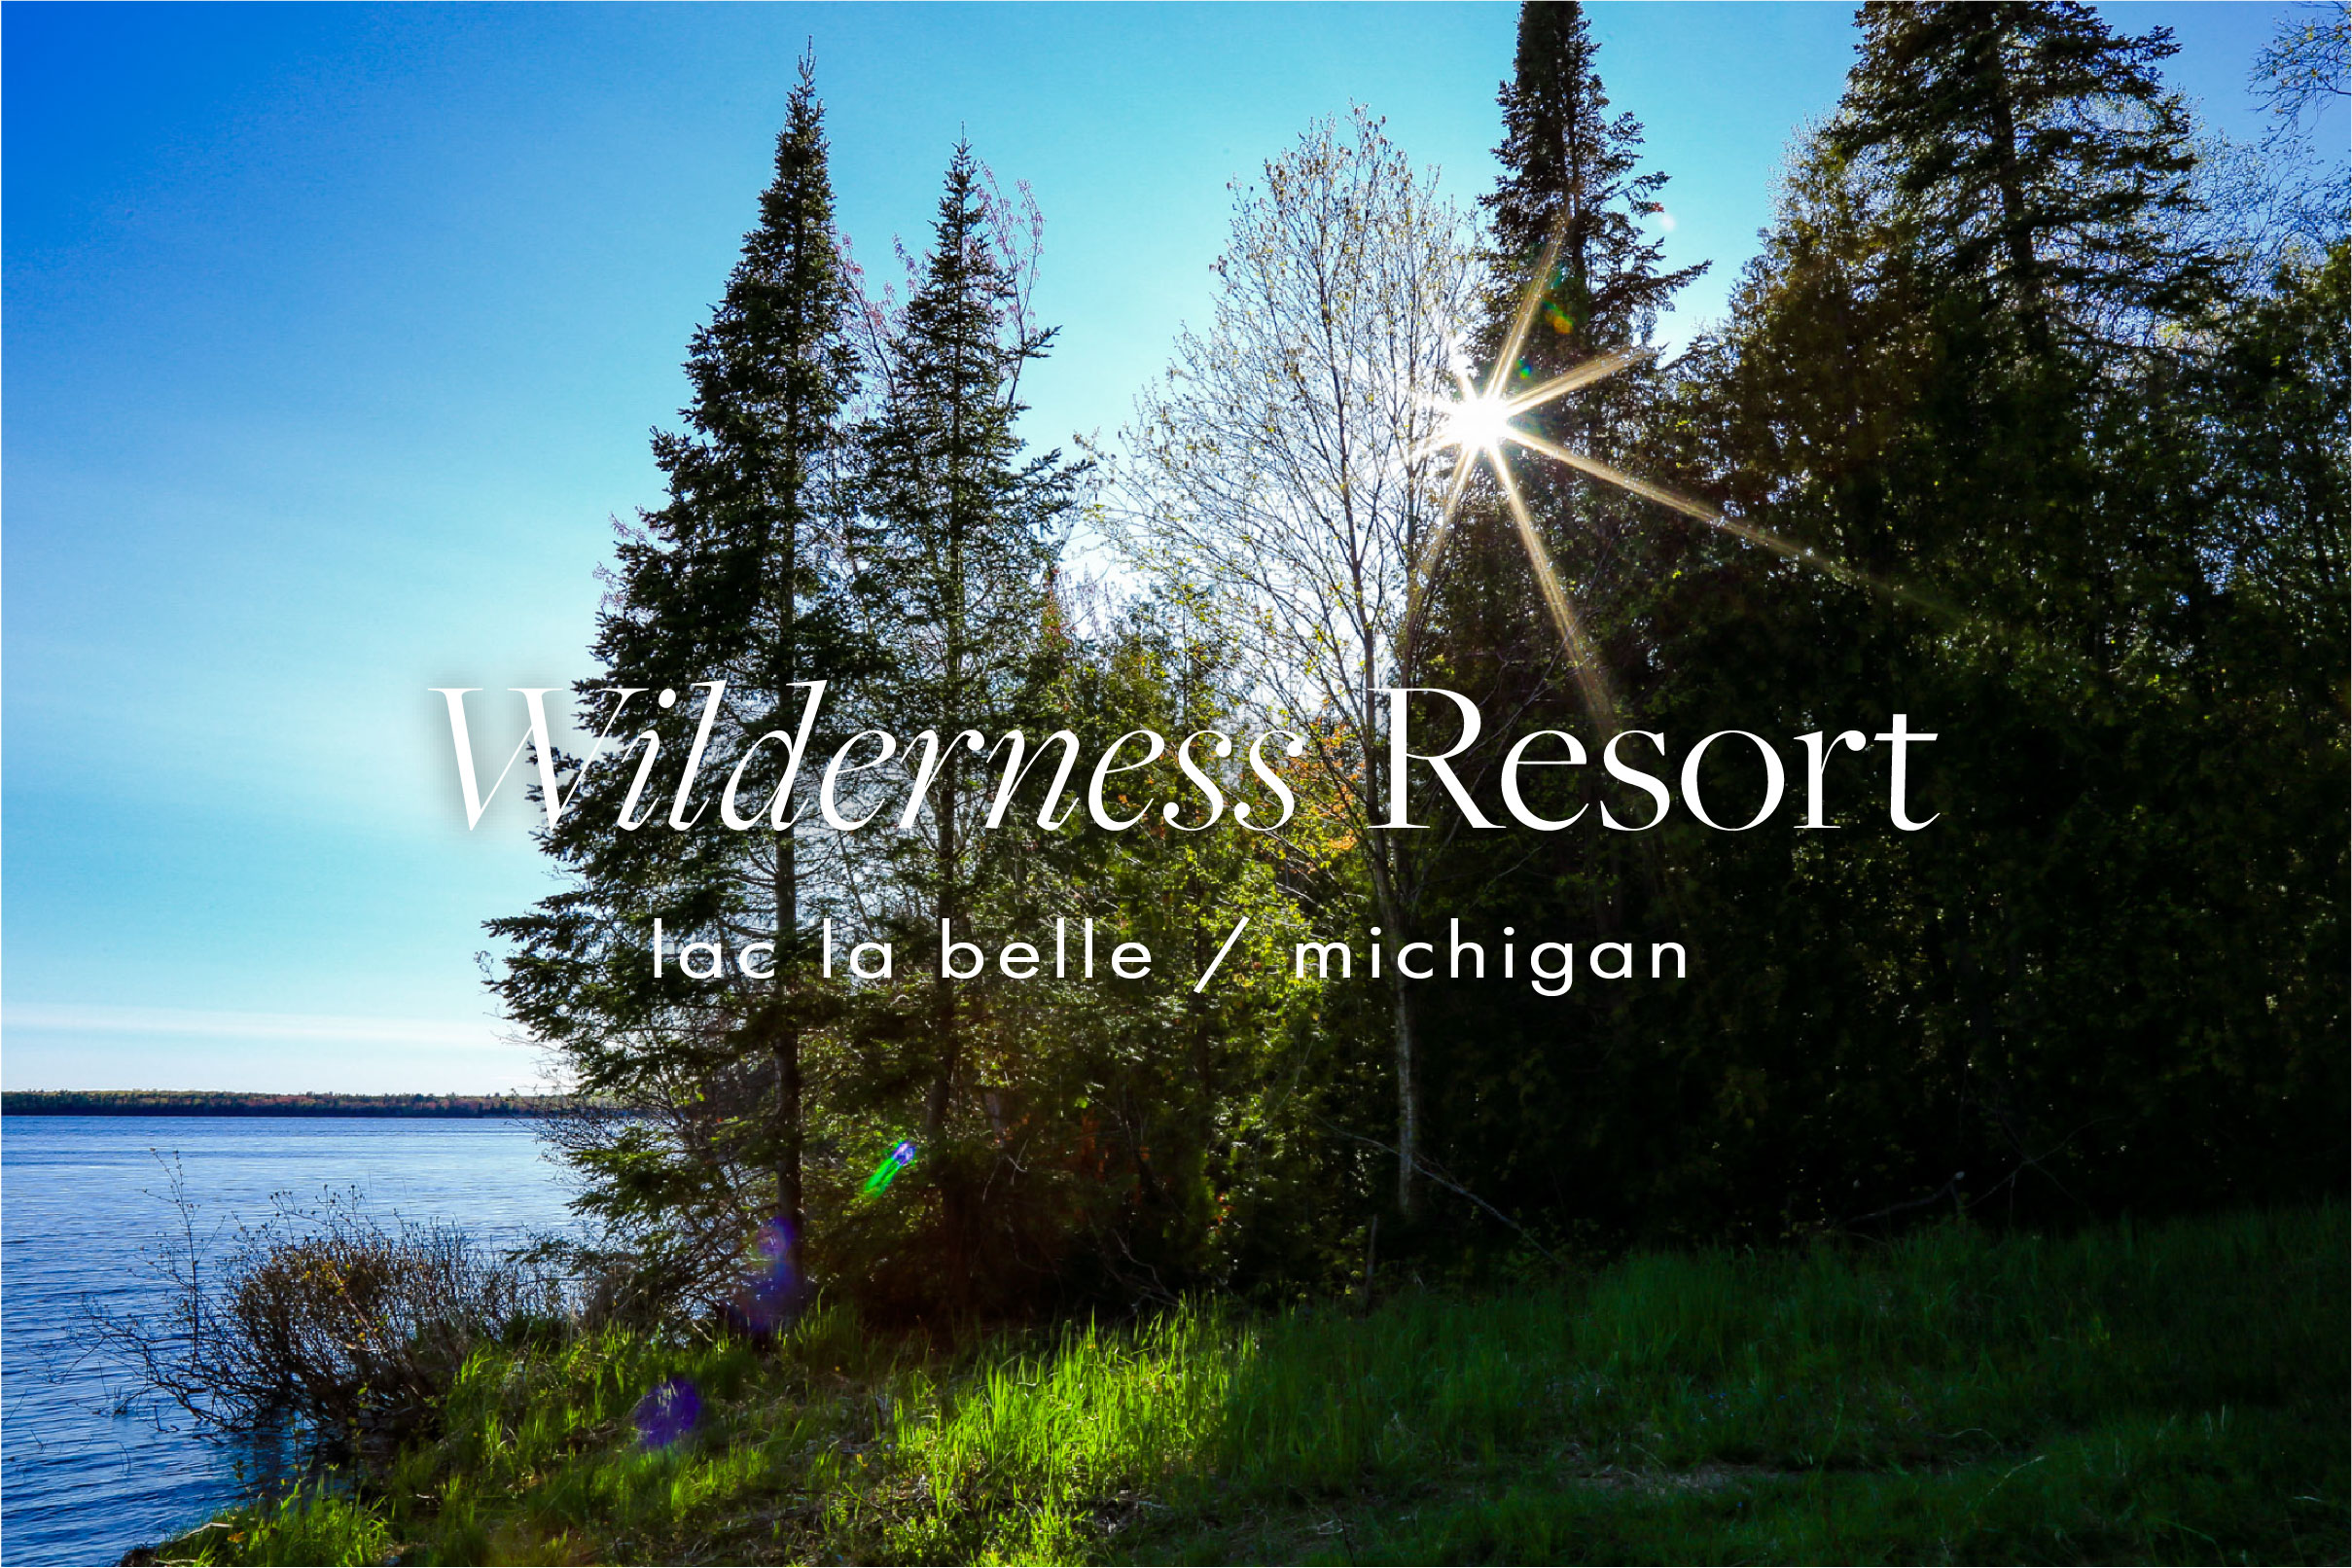 New website of the Wilderness Resort in Lac La Belle Michigan